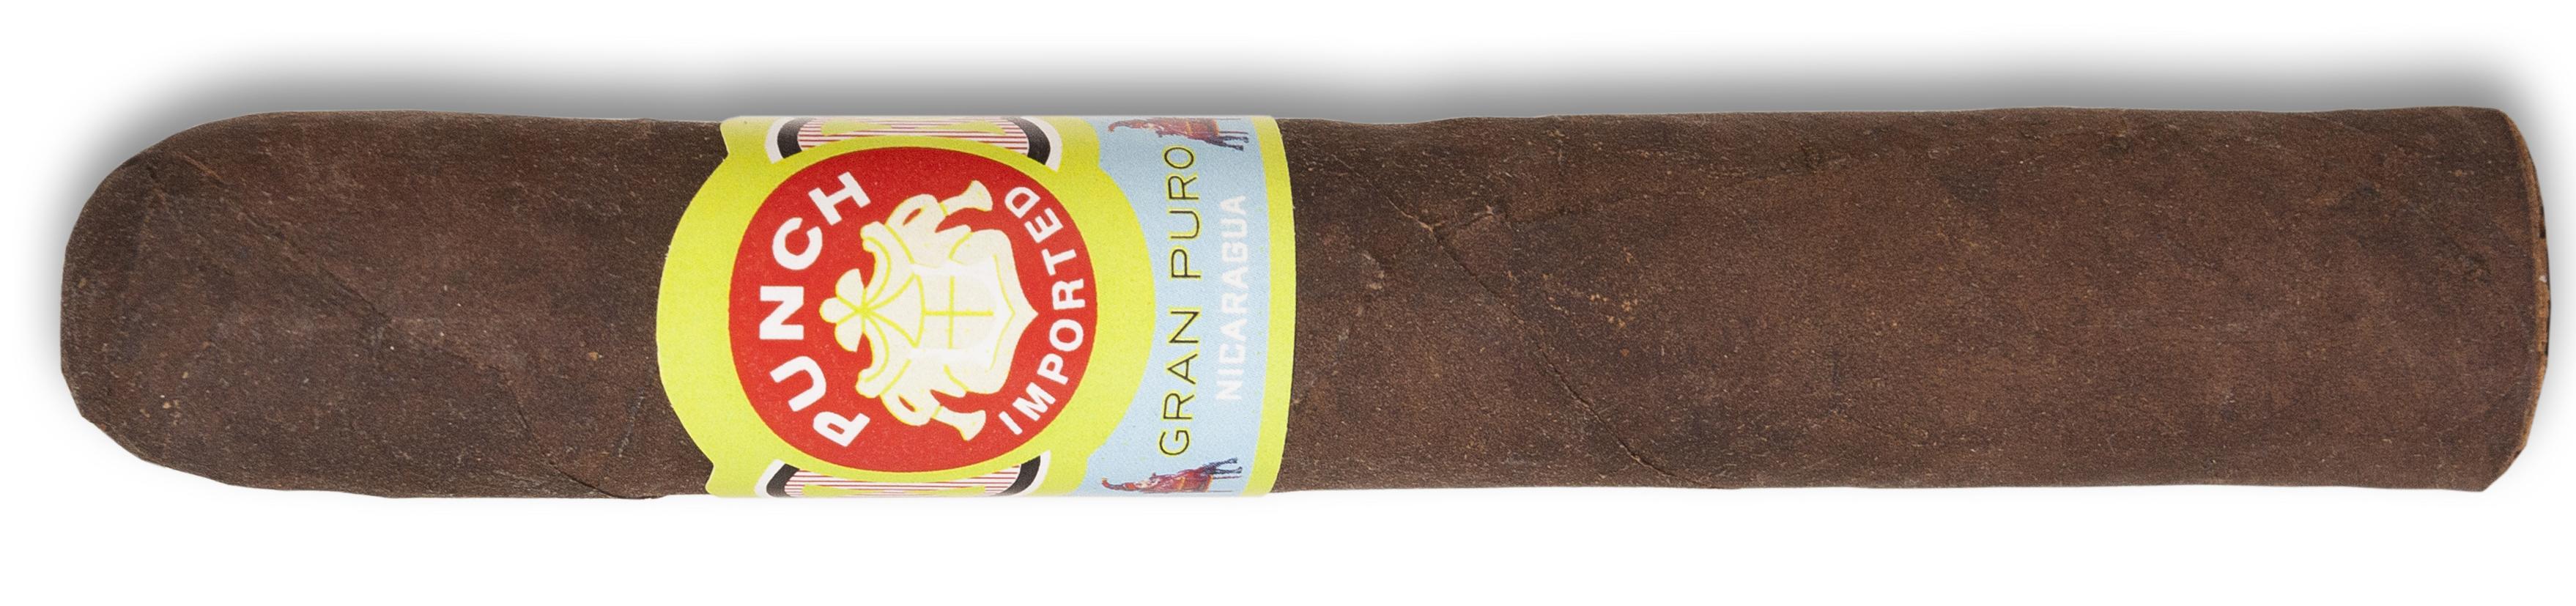 punch_granpuro_cigar